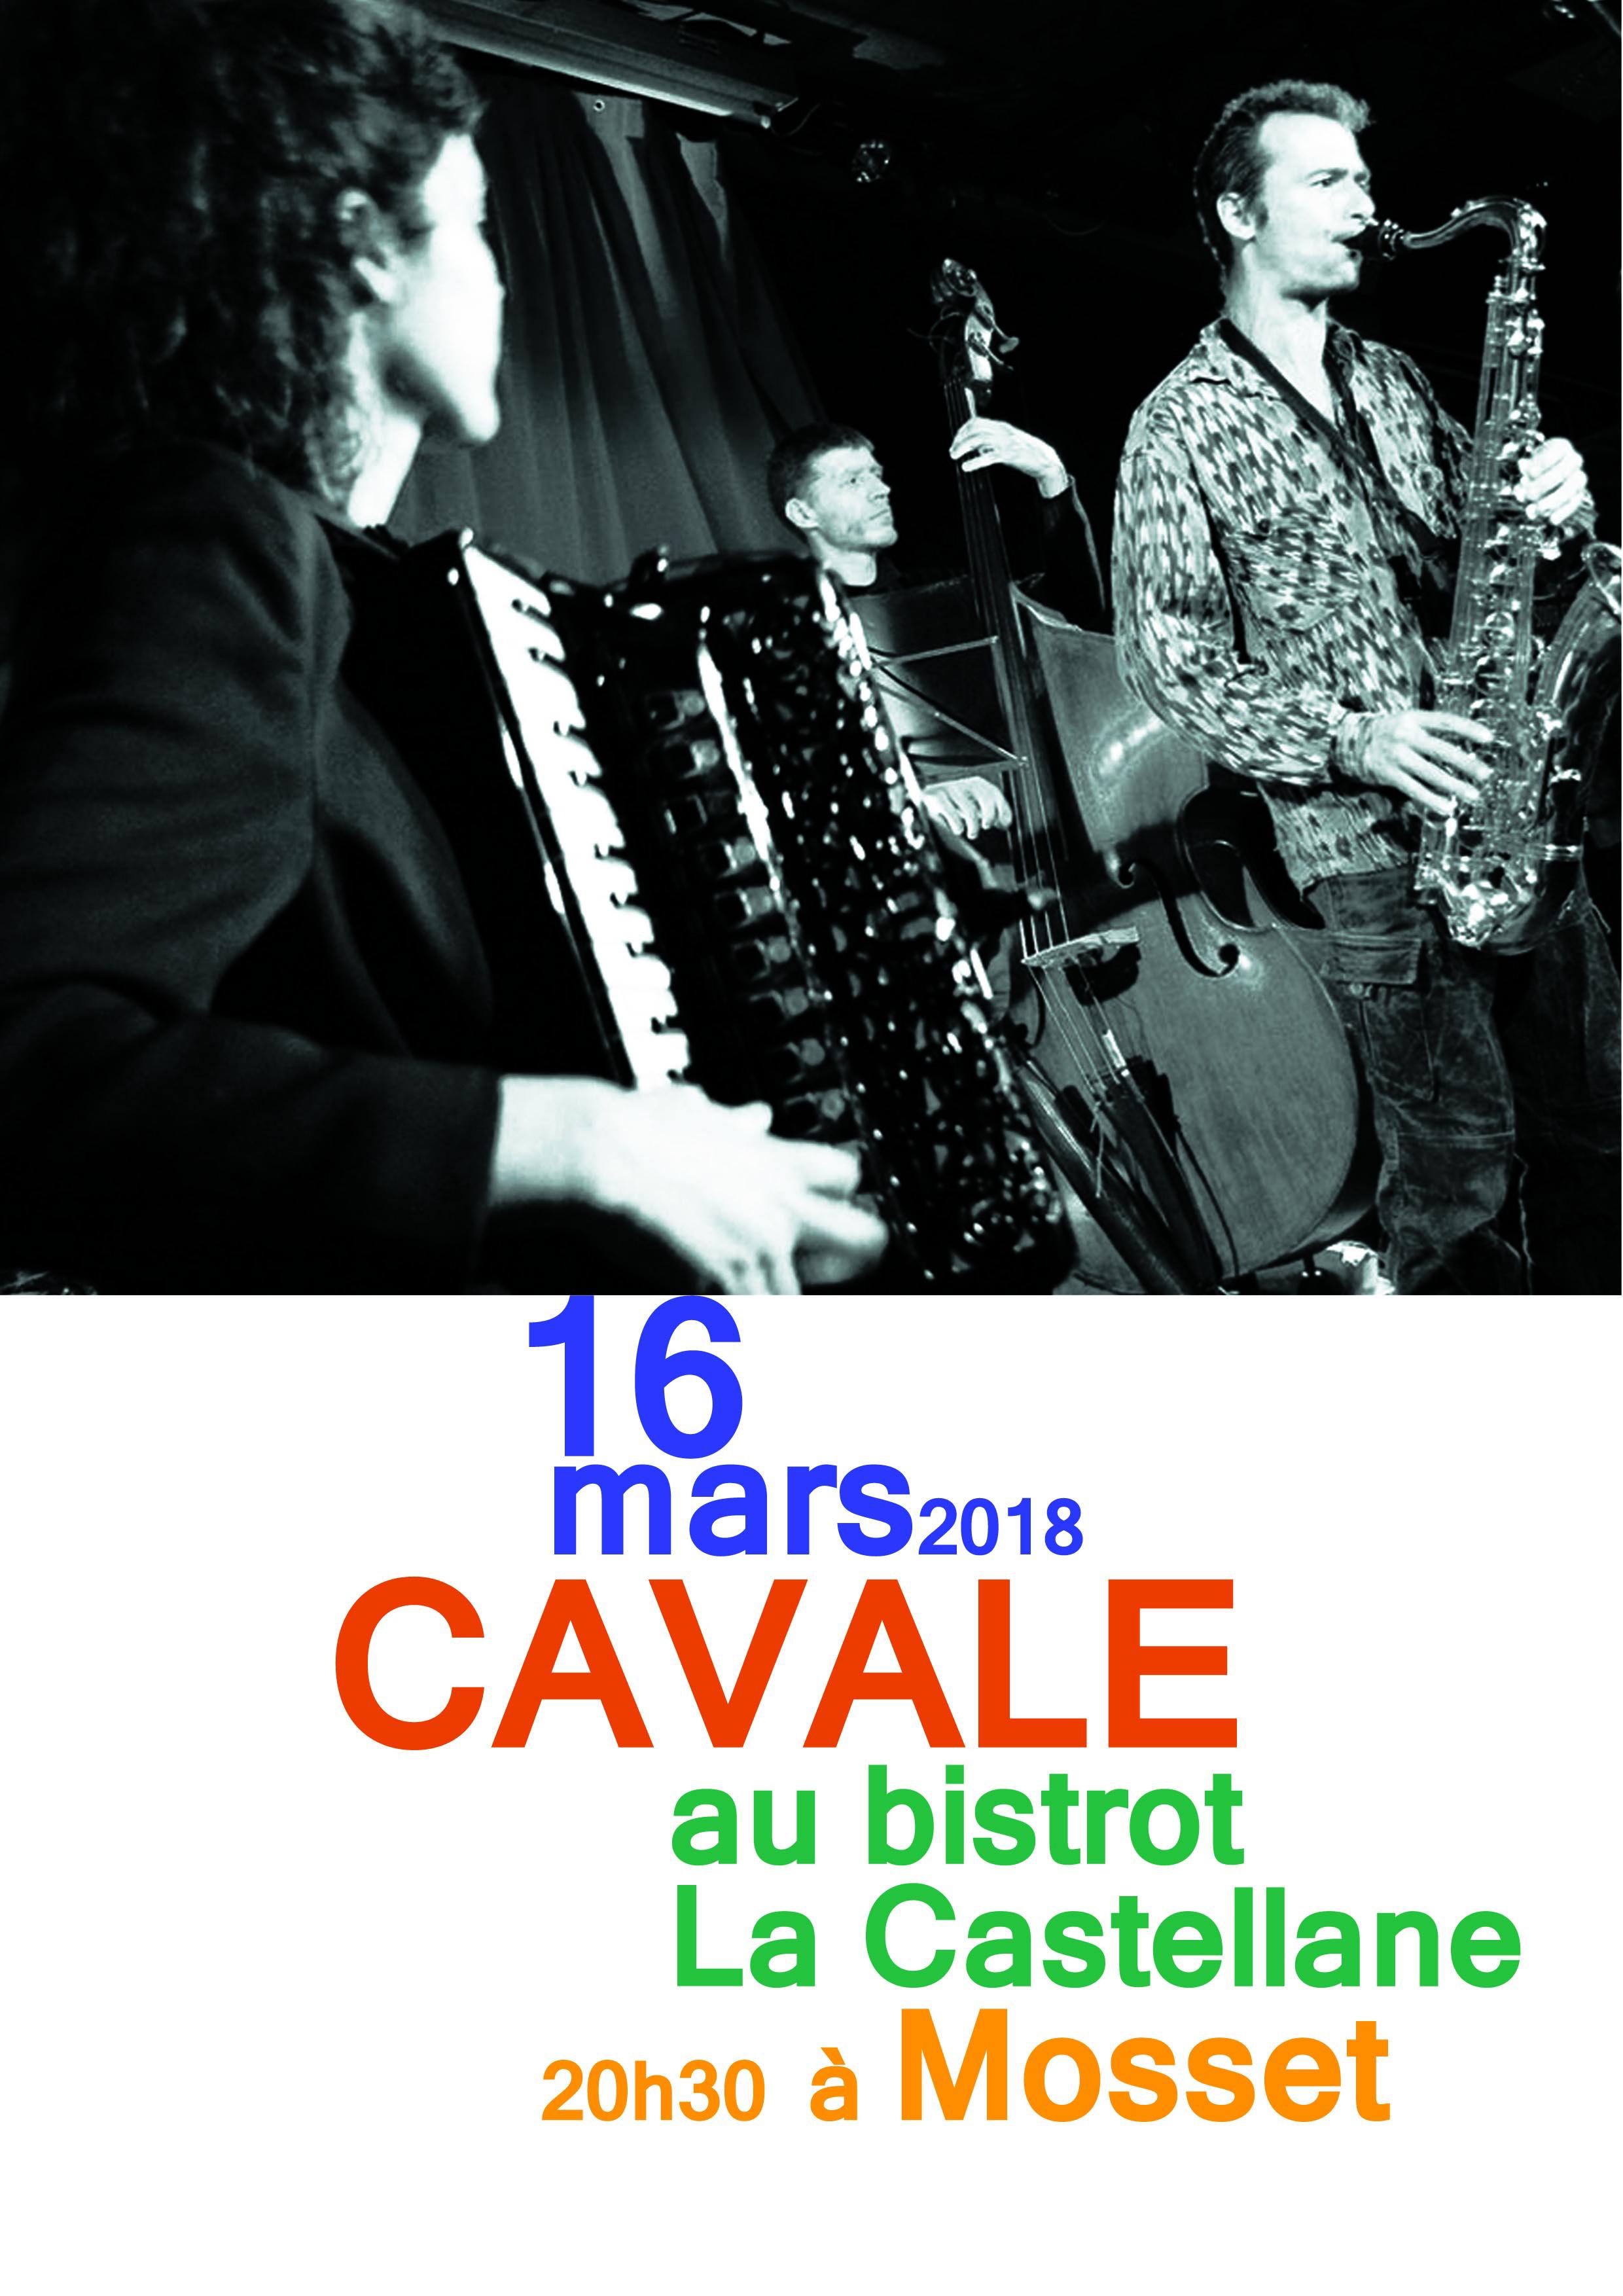 cavale-mosset-mars2018 copier